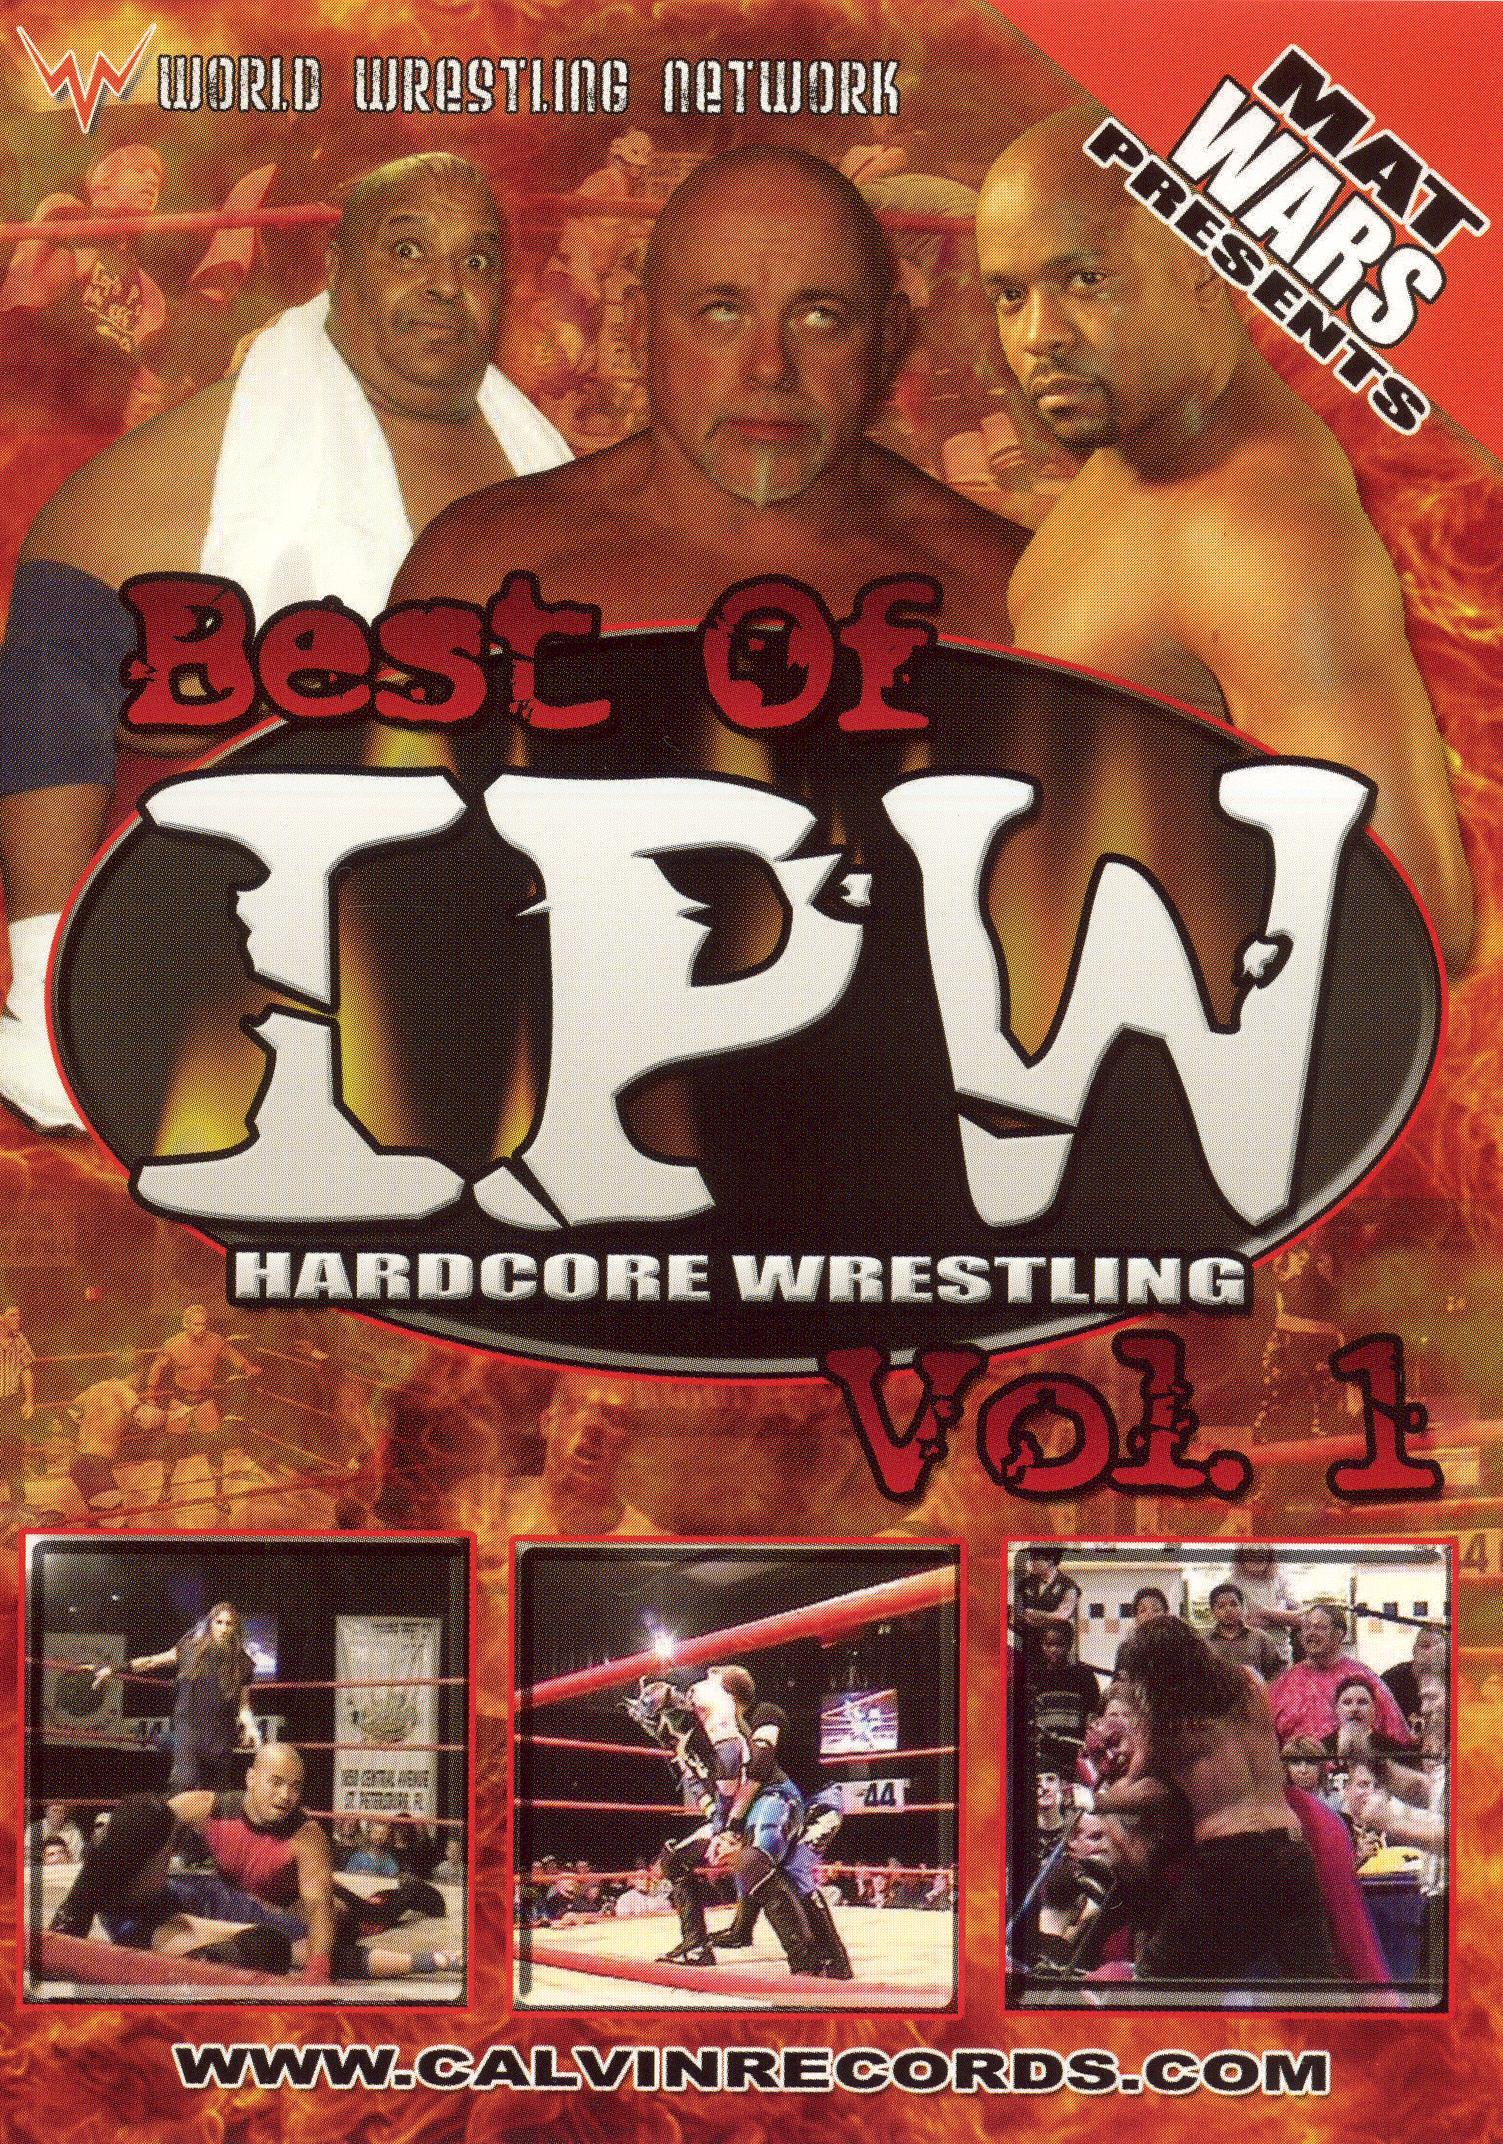 Mat Wars: Best of IPW Hardcore Wrestling, Vol. 1